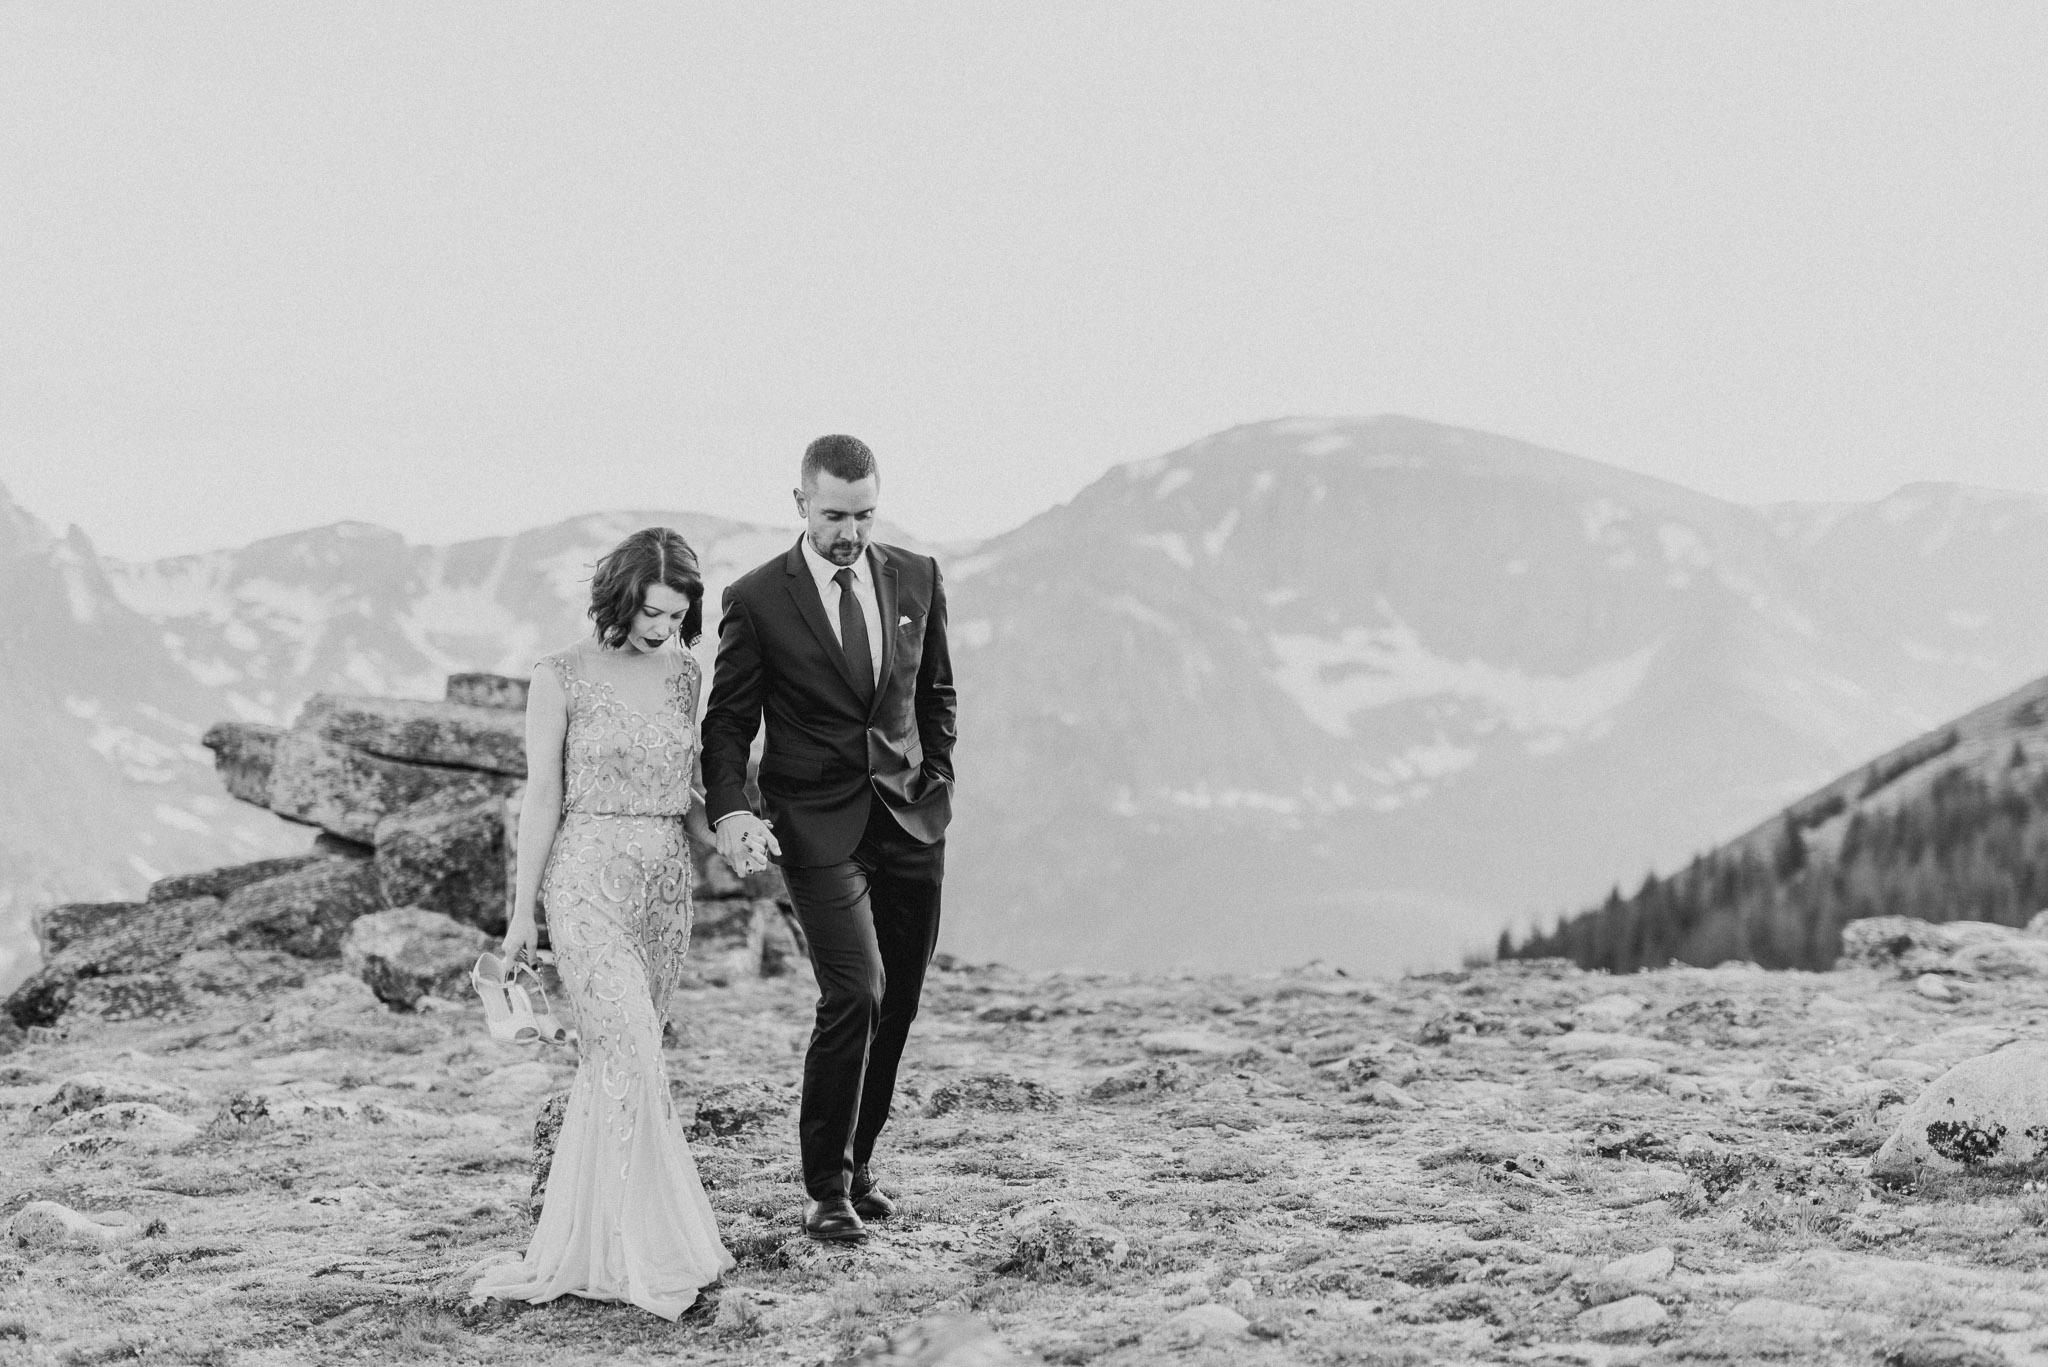 Rocky-mountain-national-park-vintage-adventure-engagement-colorado-session-photographer